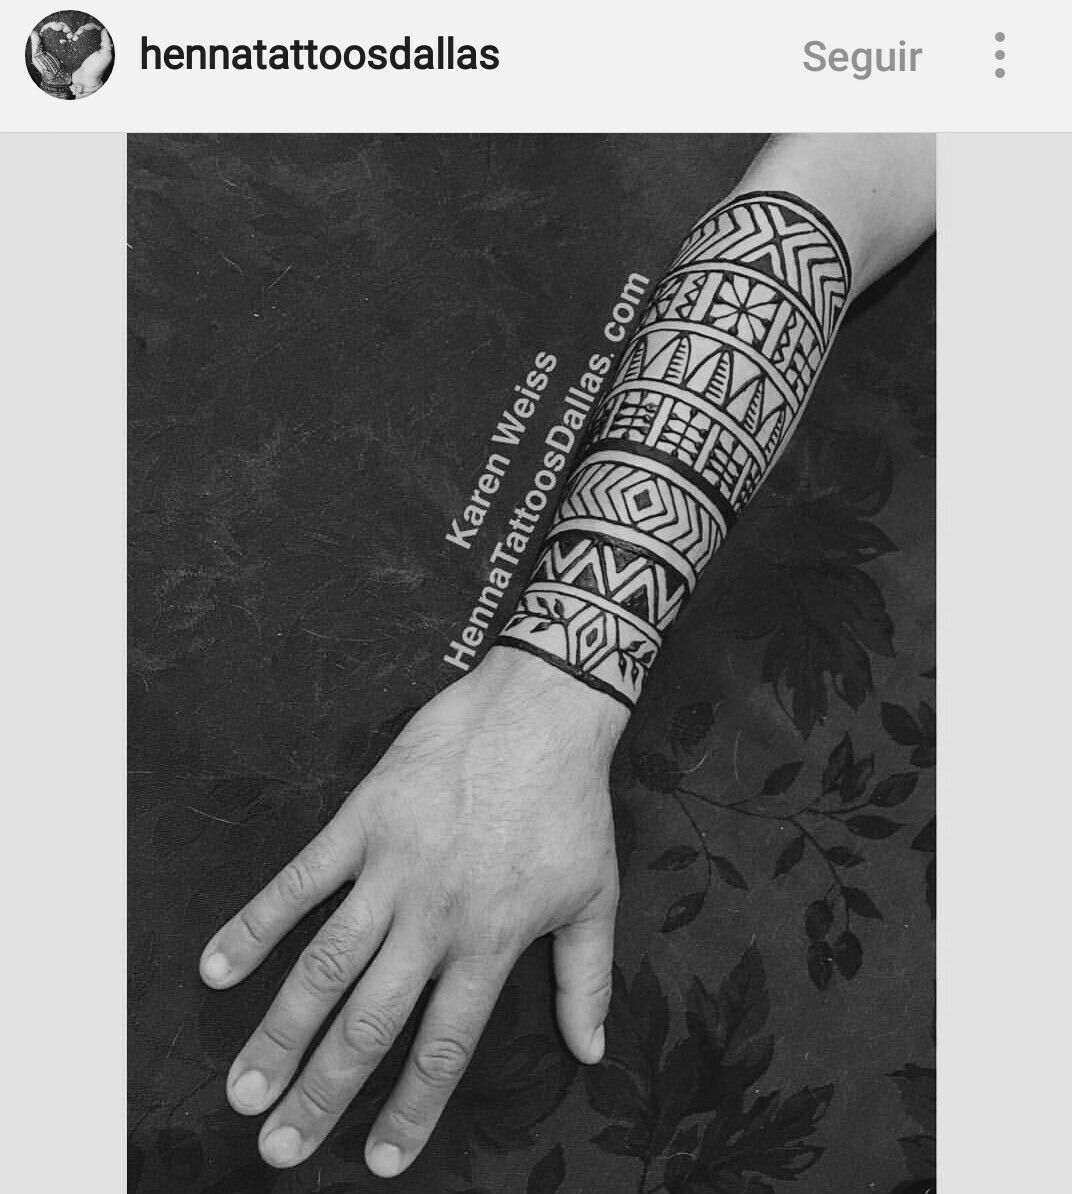 Henna Tattoo For Guys: Men Henna Tattoo, Henna Tattoo Designs